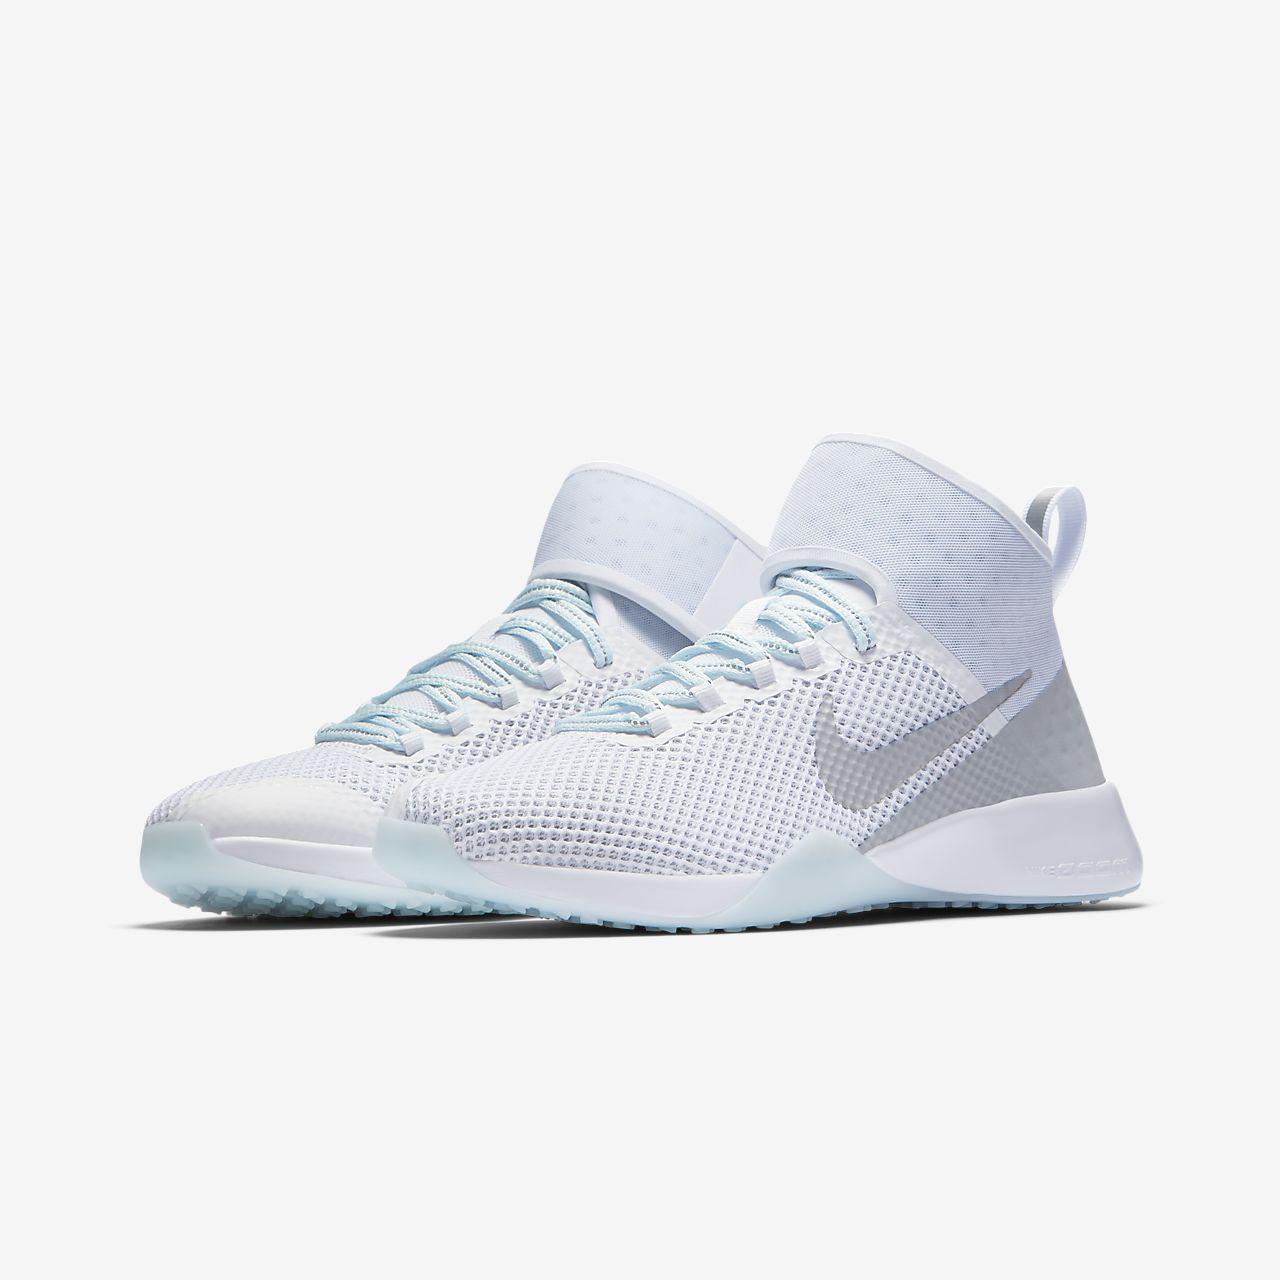 Nike Air Zoom Strong 2 Metallic Women's Training Shoes Black/Blue xE1228N